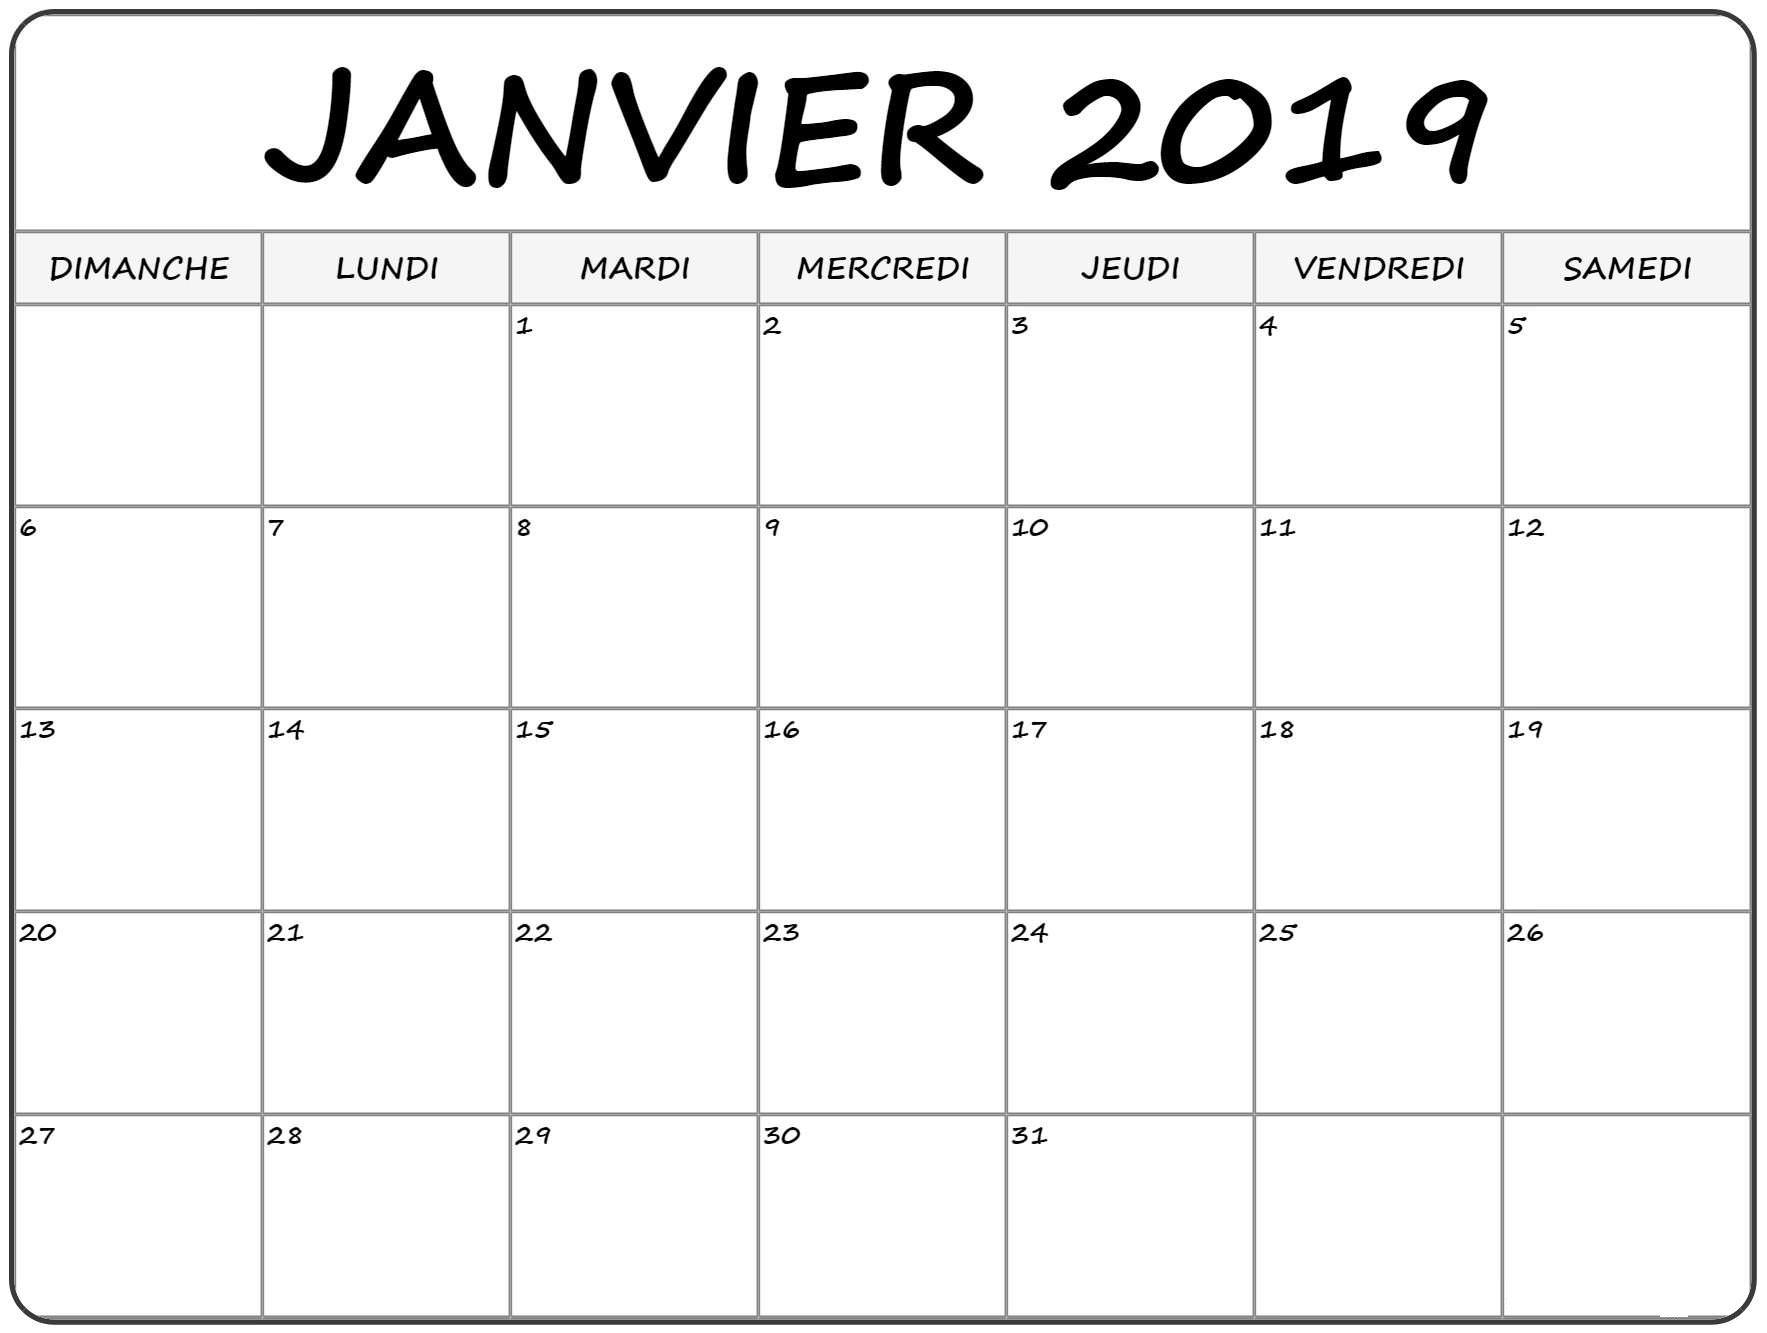 Calendrier A Imprimer Janvier 2019.Calendrier Janvier 2019 A Imprimer In 2019 January